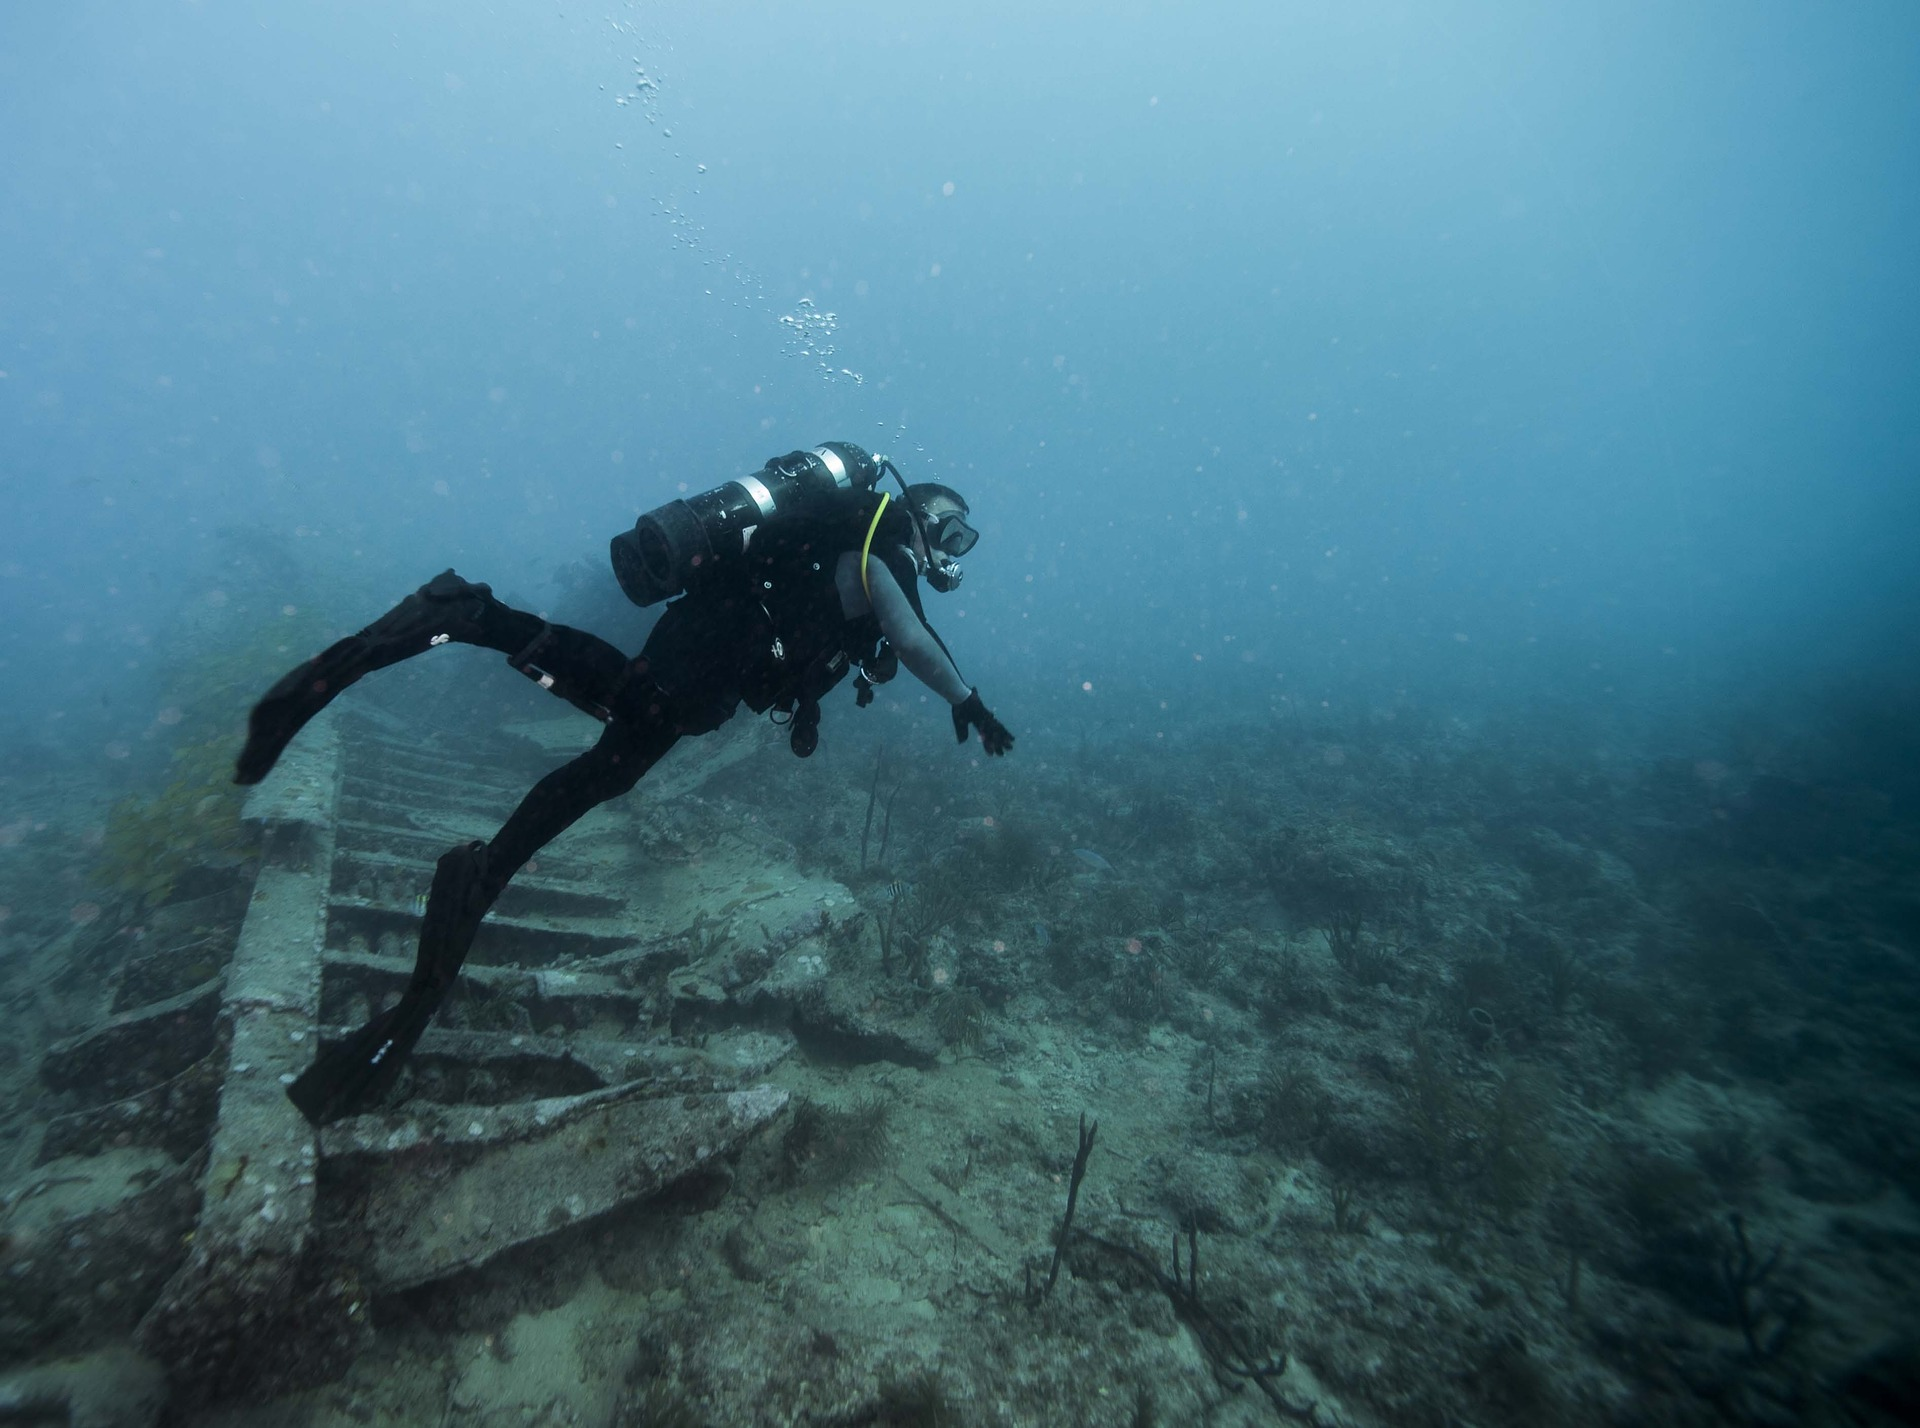 How To Get Your Scuba Diving Certification - trekbible